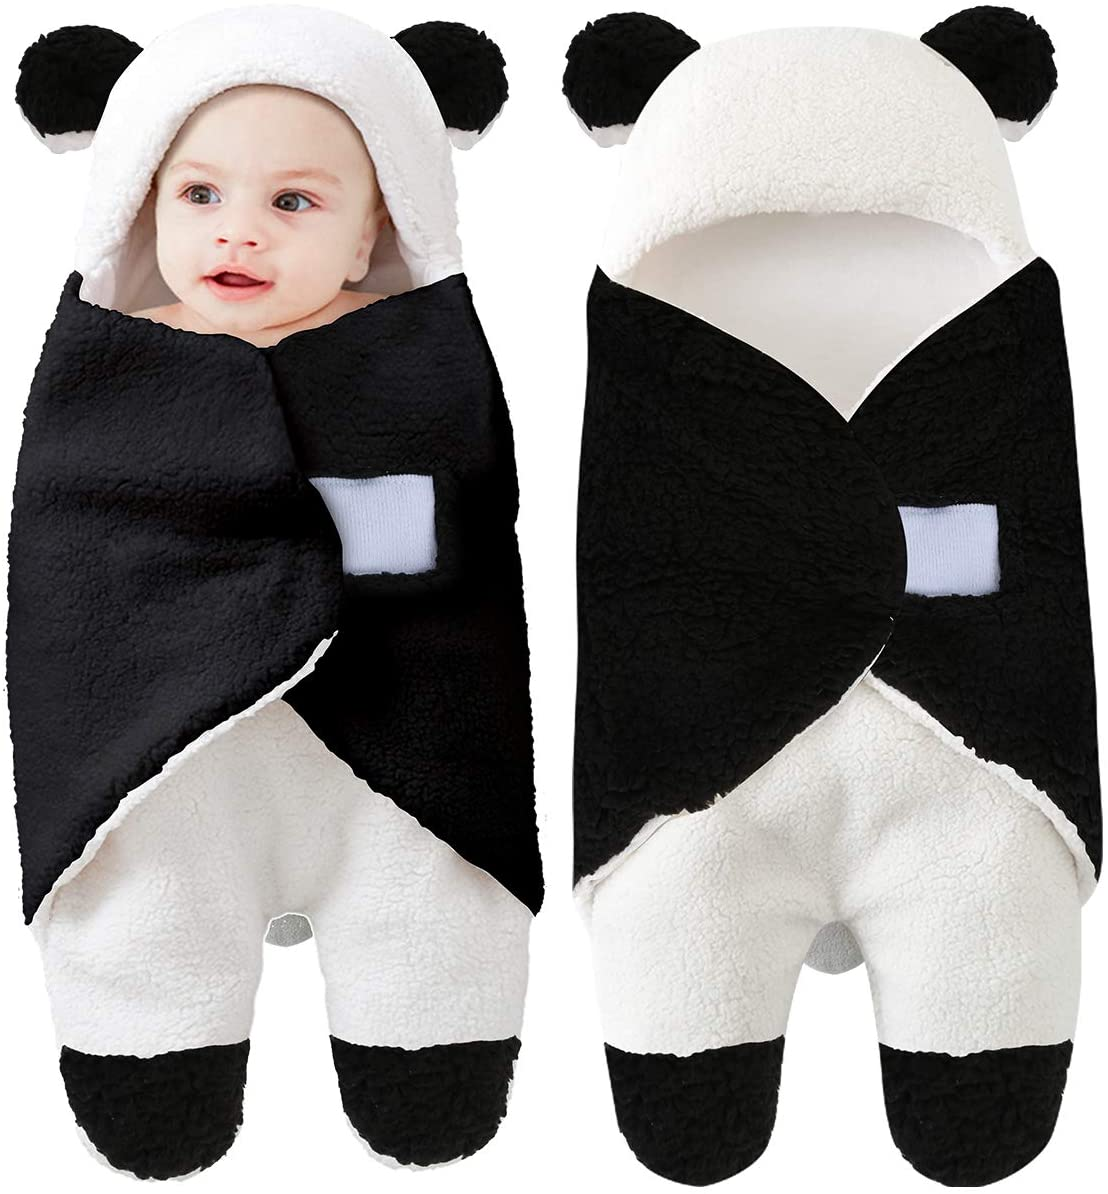 Camidy Newborn Swaddle Blanket,Infant Warm Stroller Wrap Baby Sleeping Bag Sack for Boys Girls